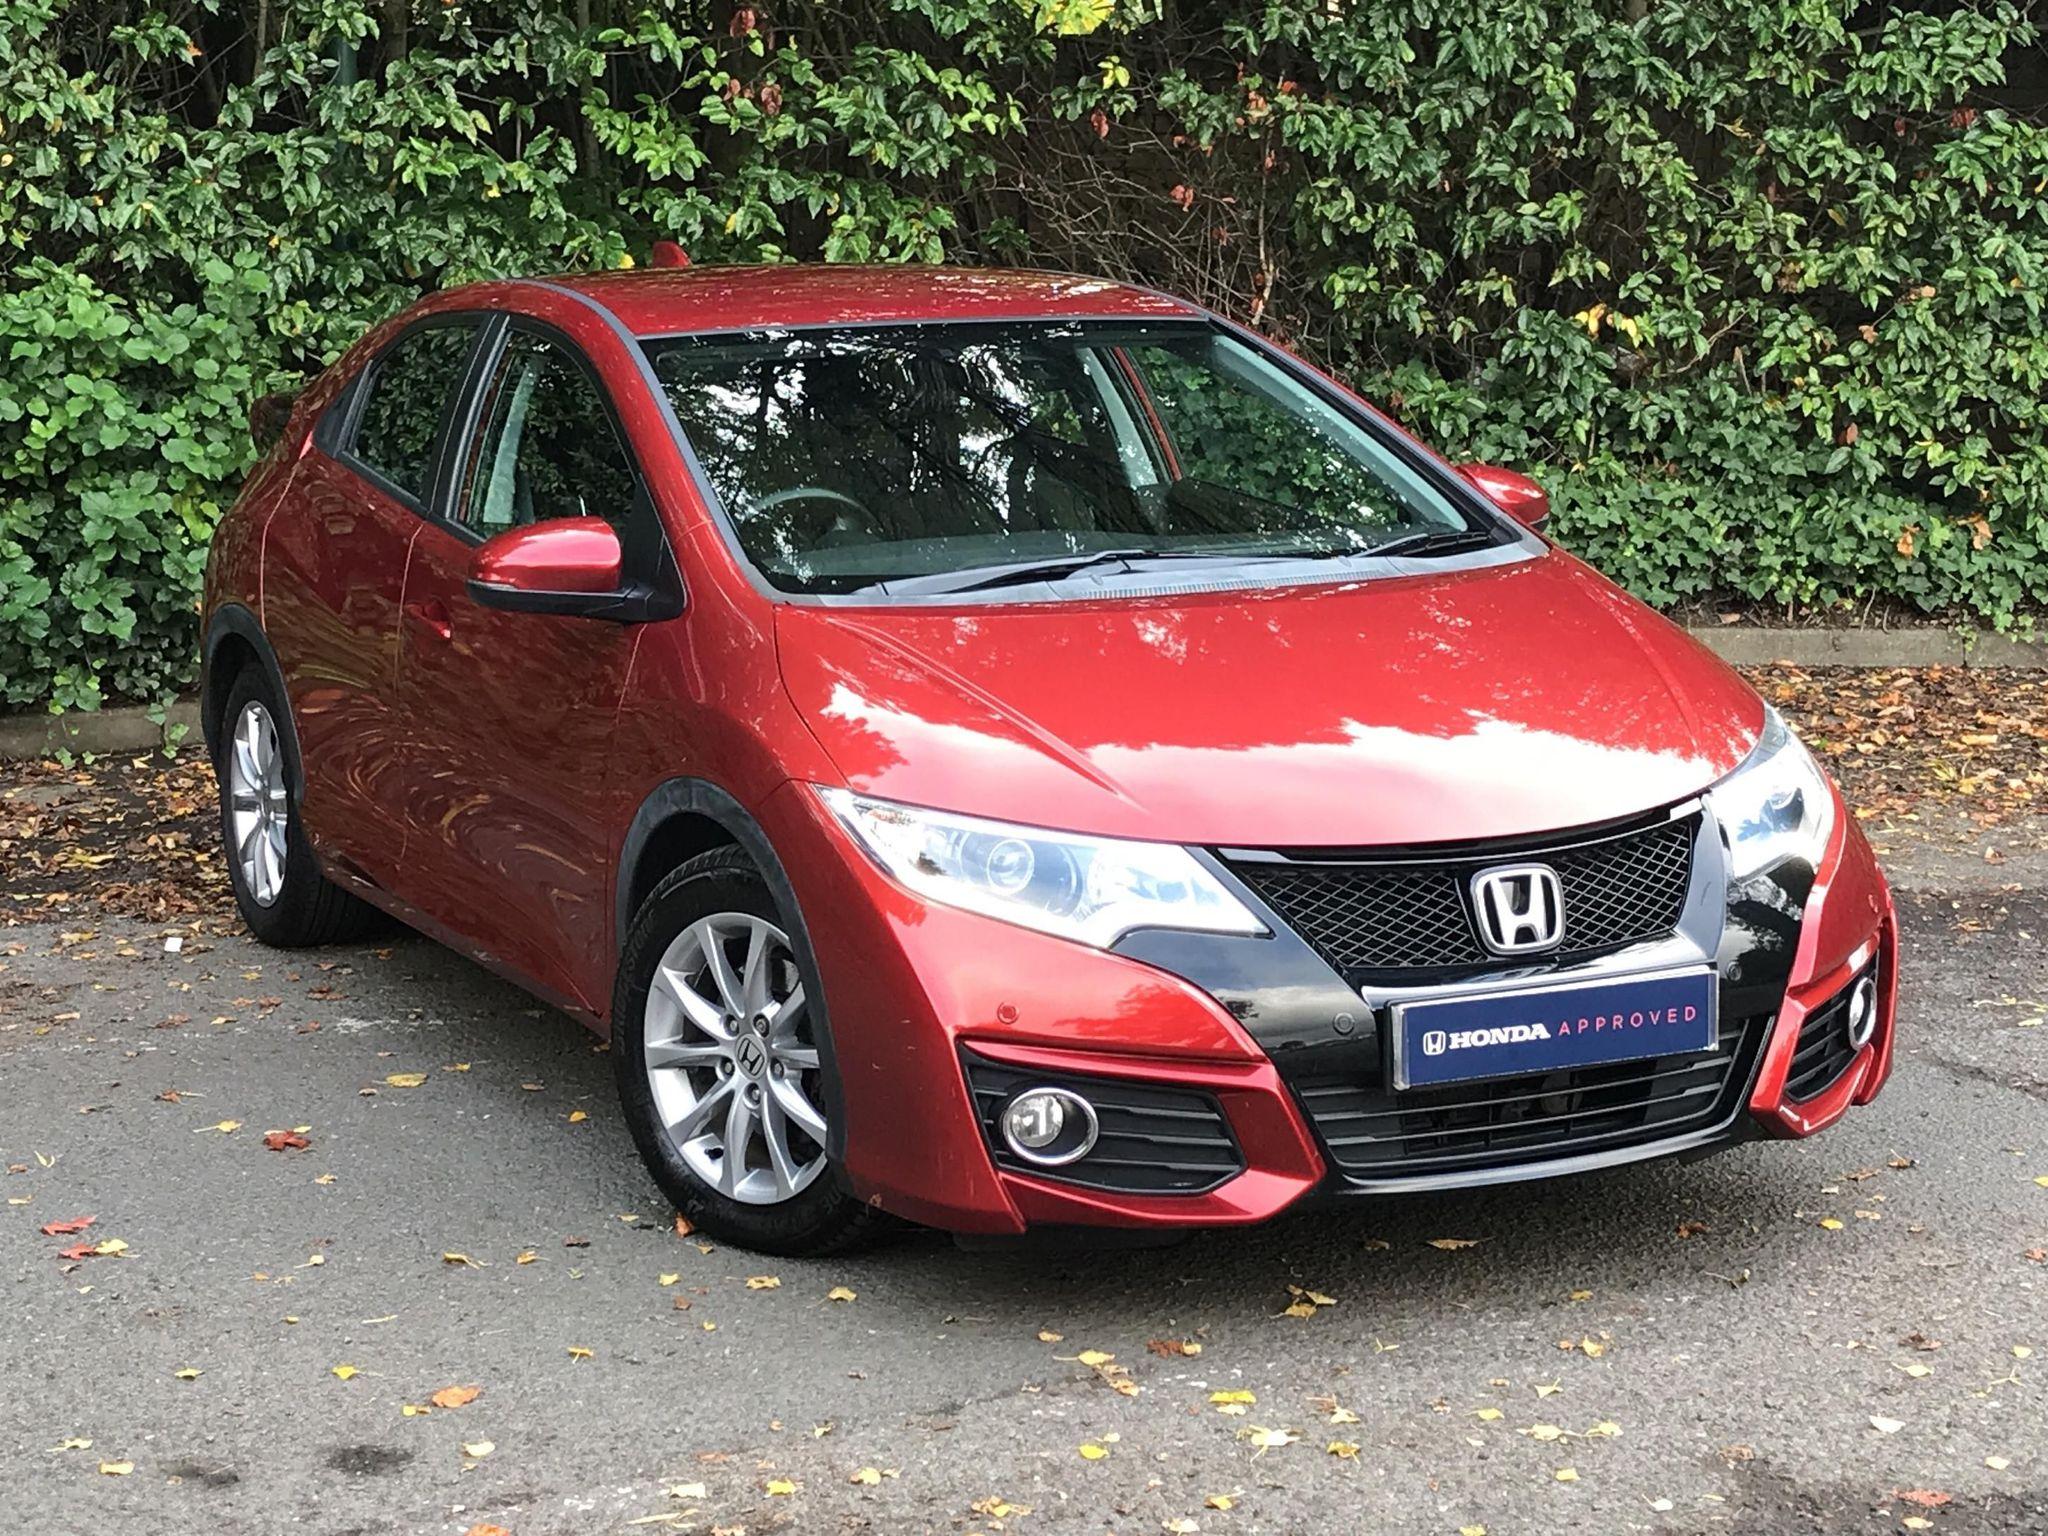 Honda Civic 1.6 i-DTEC SE Plus (s/s) 5dr